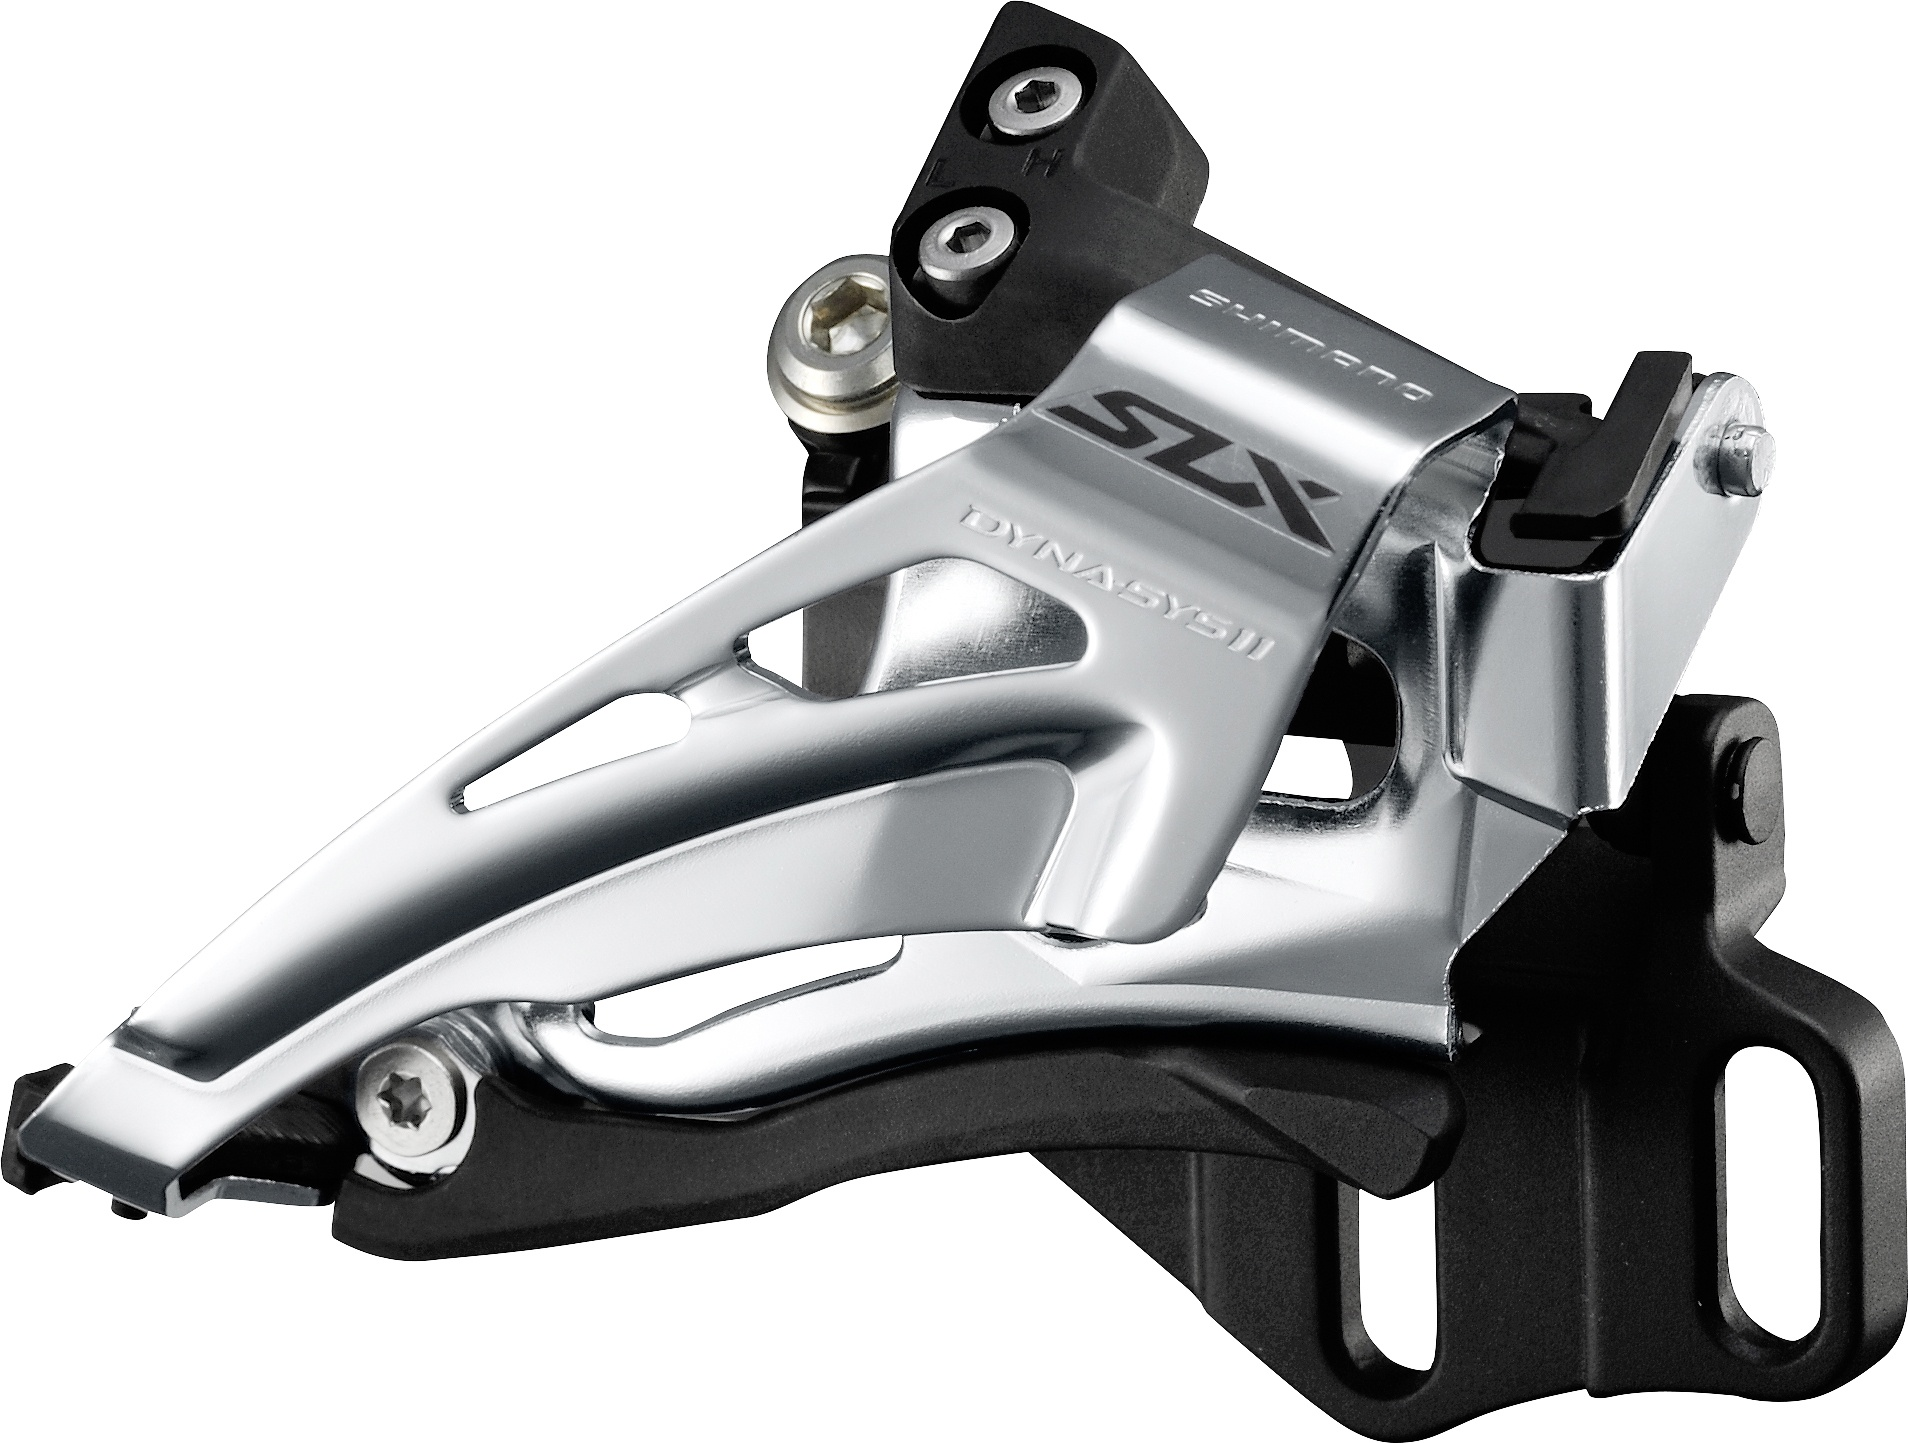 SHIMANO přesmykač SLX FD-M7020 MTB pro 2x11 př mont E-typ bez BB Top-swing down-pull 34/38 z